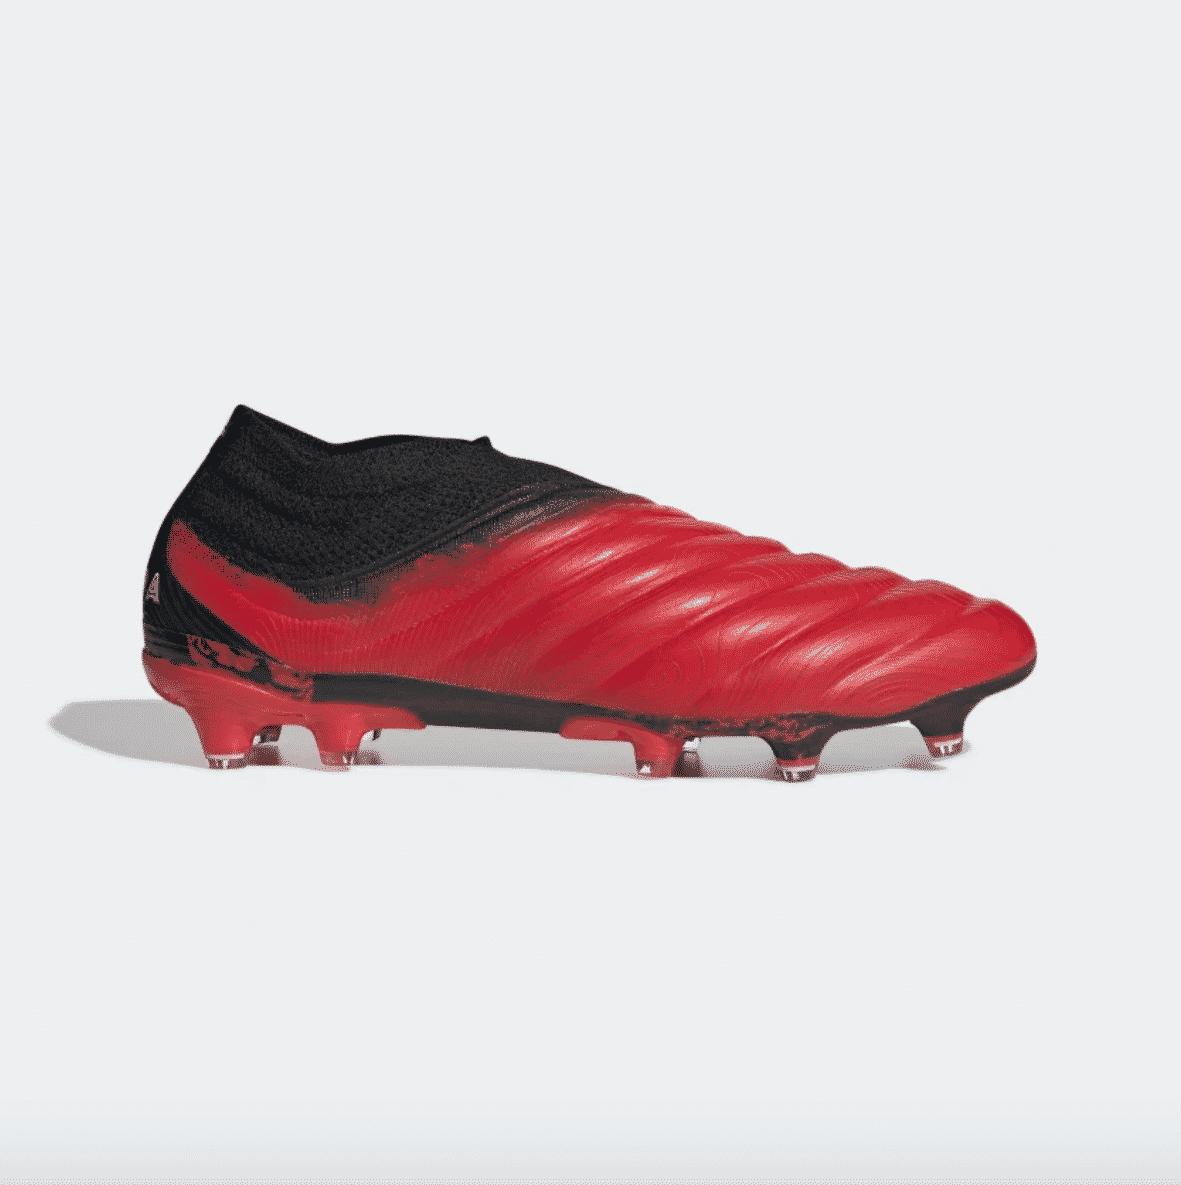 adidas-copa-pack-mutator-janvier-2020-2